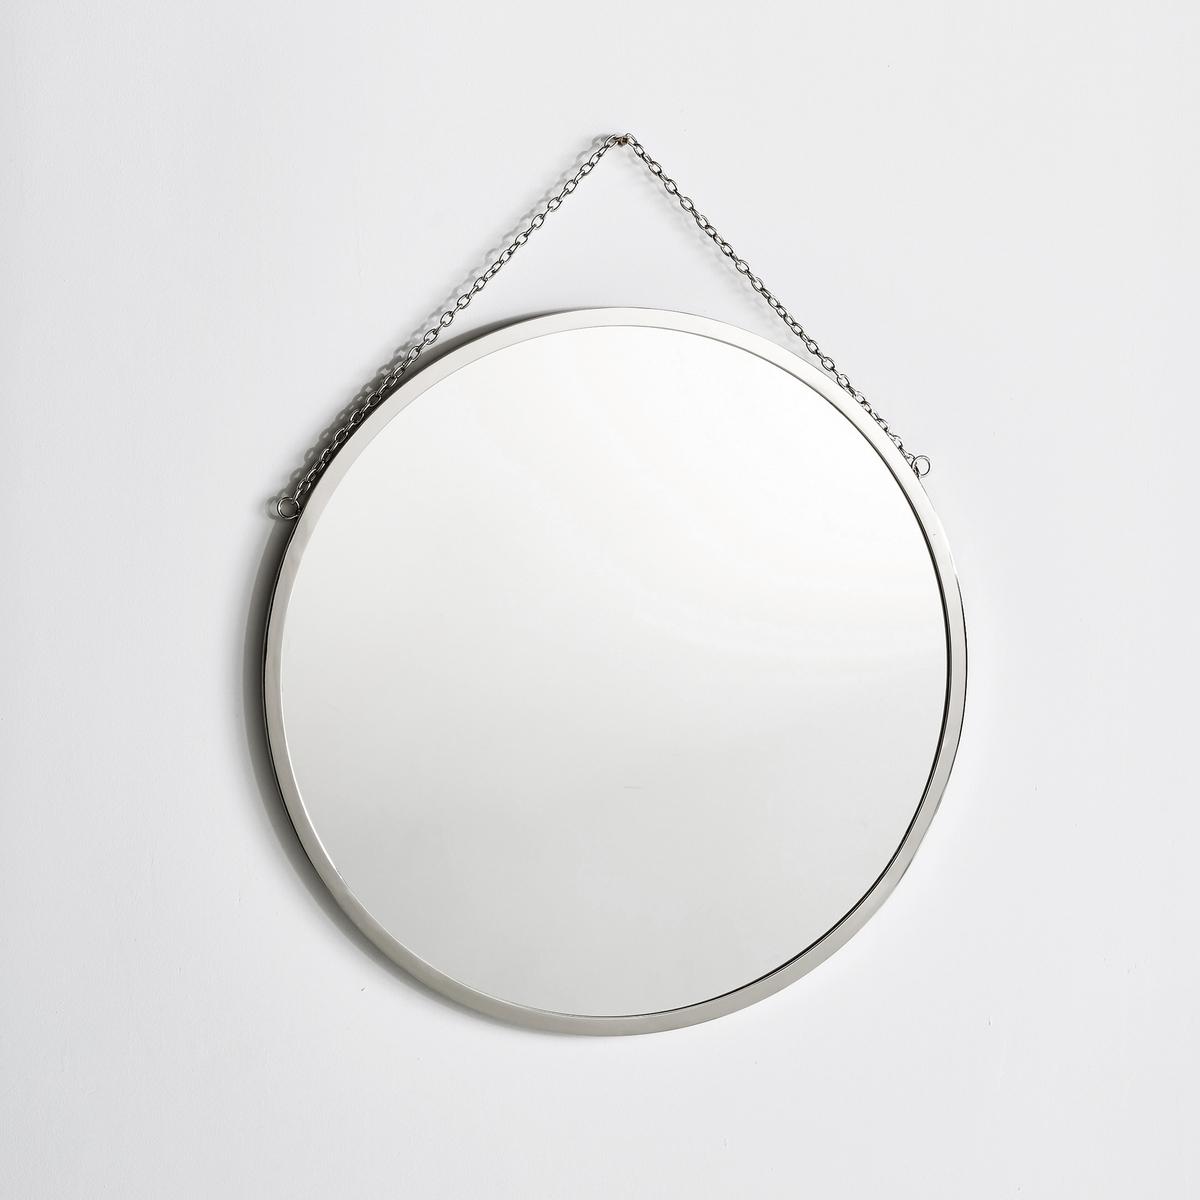 Зеркало круглое Ø60 см зеркало круглое ø60 см